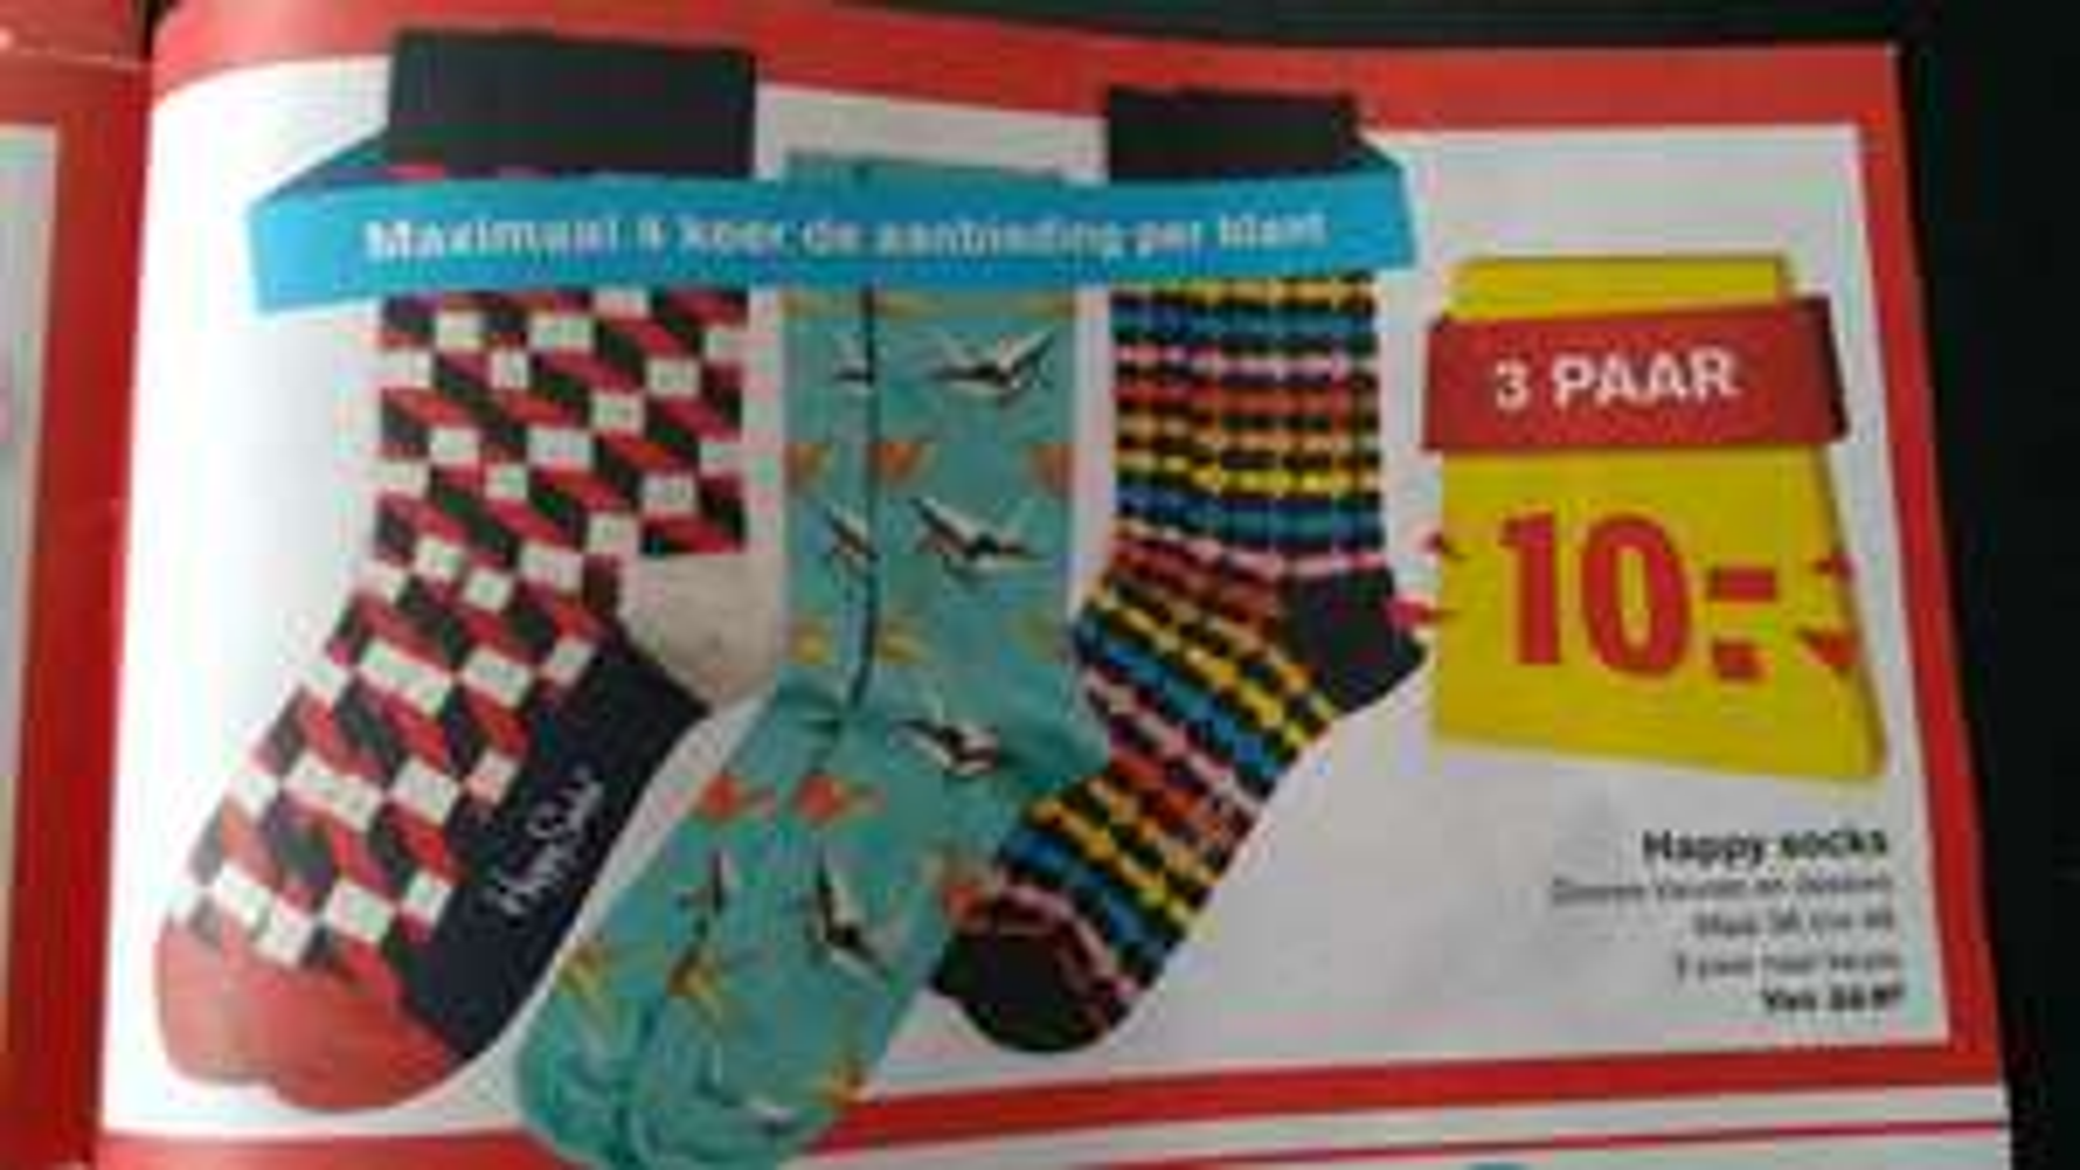 3 paar Happy Socks 10,- Hoogvliet